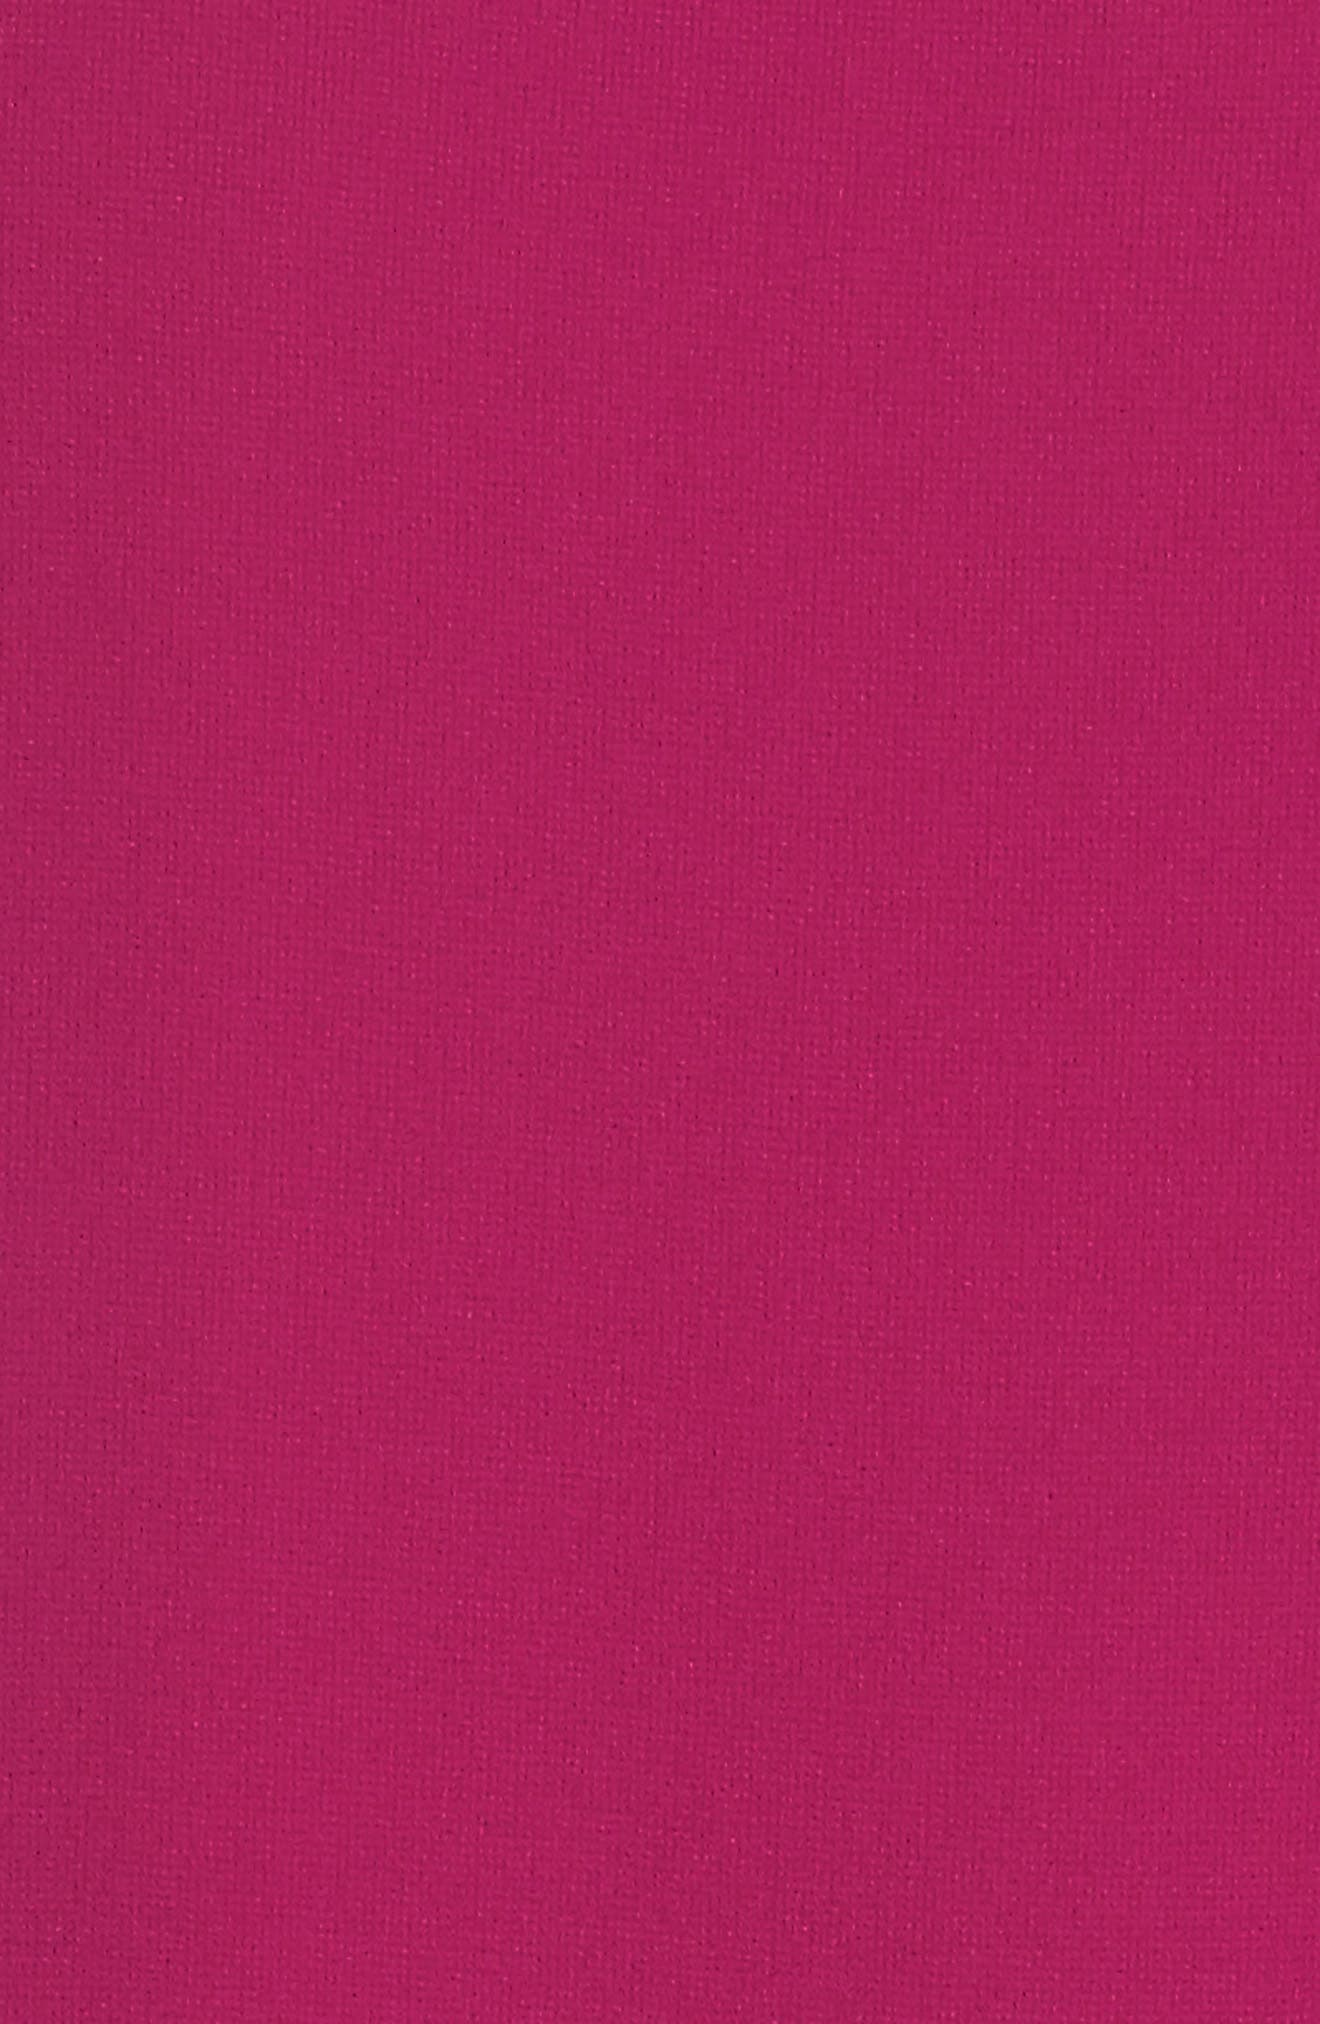 Ruffle Chiffon Shift Dress,                             Alternate thumbnail 5, color,                             Magenta